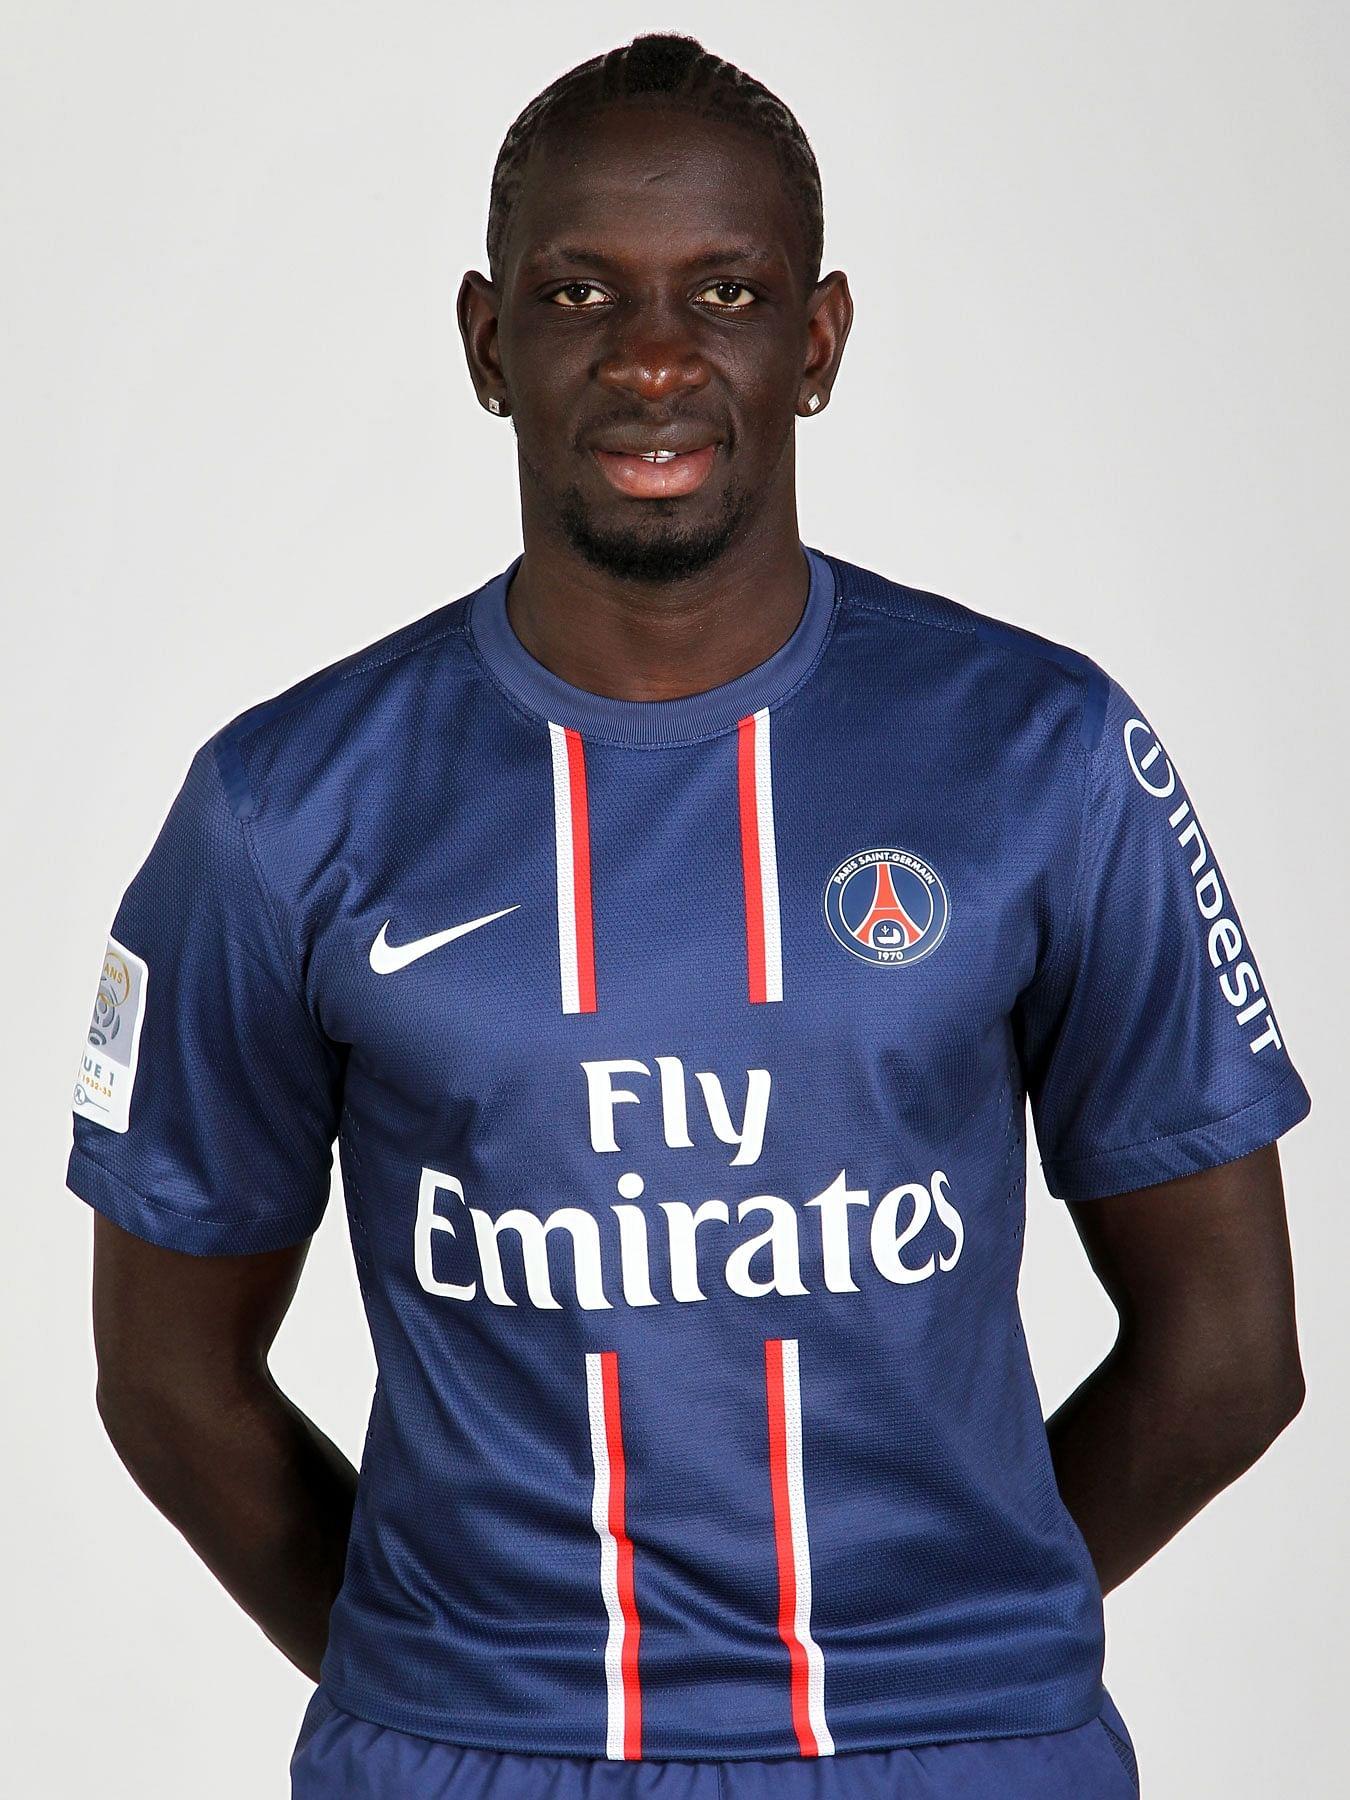 Mamadou Sakho Profile Picture